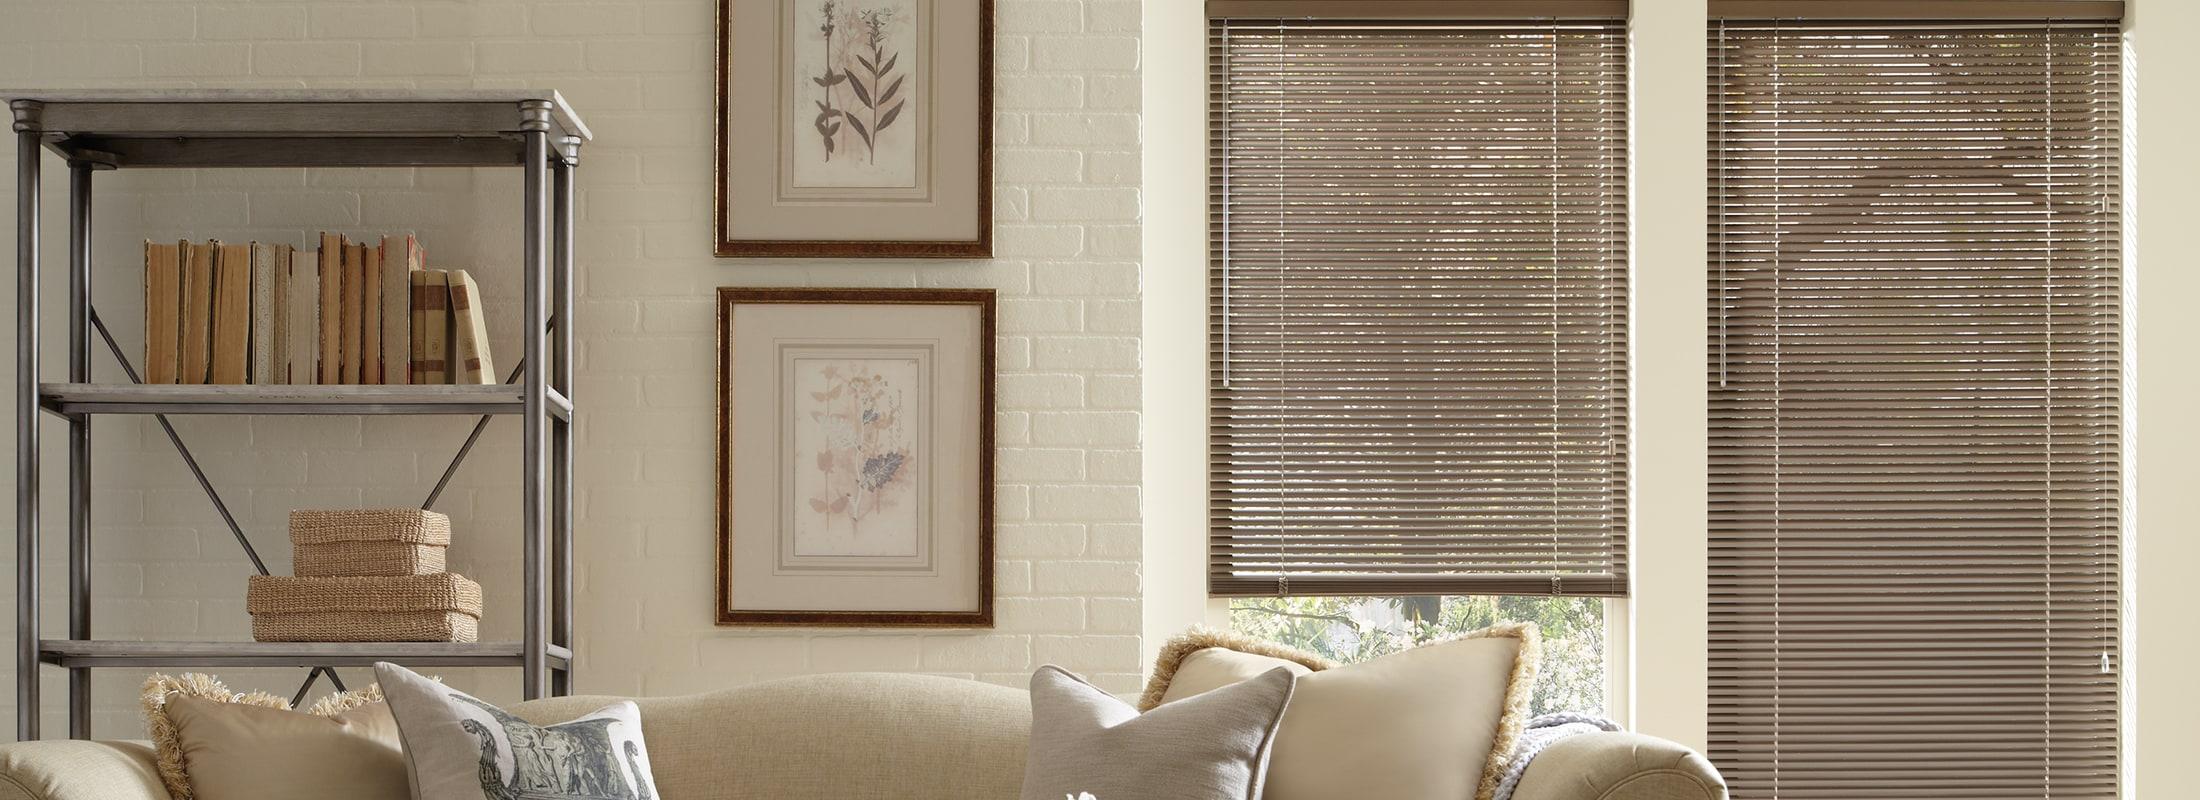 horizontal-blinds-aluminum-decor-carousel-01.jpg